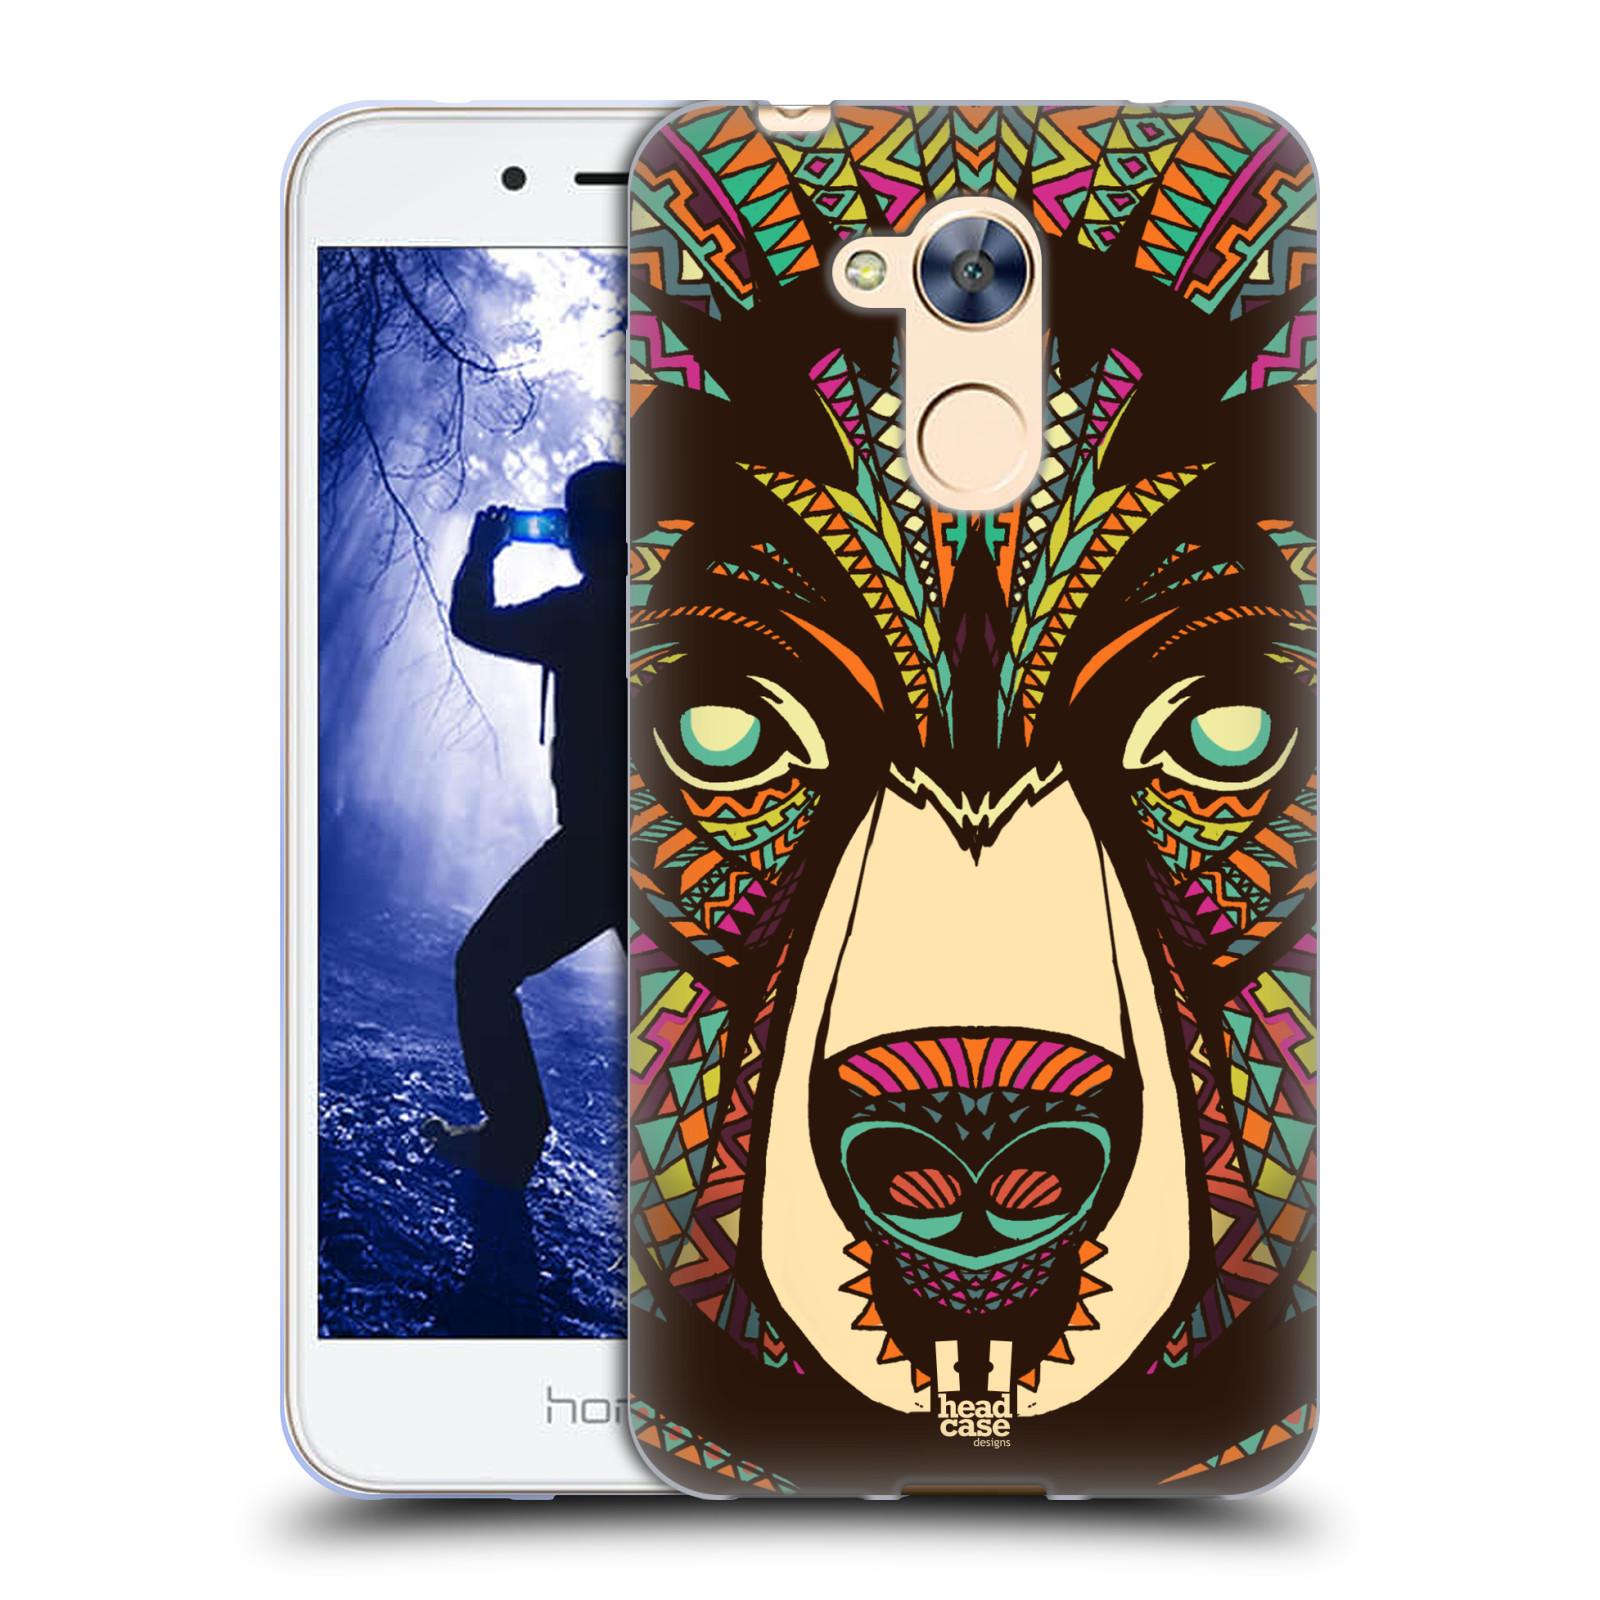 Silikonové pouzdro na mobil Honor 6A - Head Case - AZTEC MEDVĚD